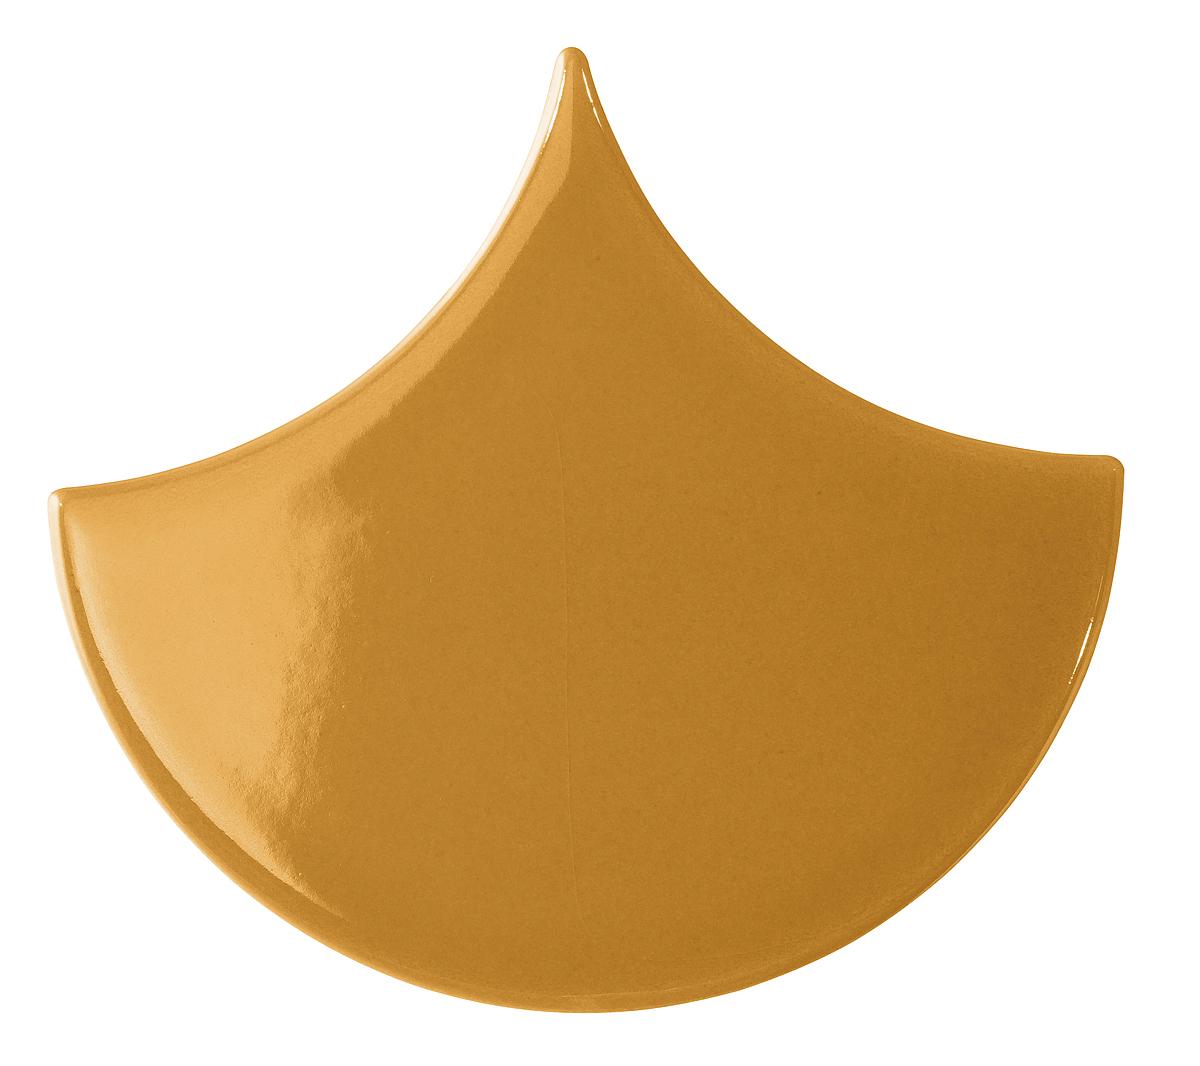 Carrelage Scales de Aleluia, Céramique, 13.5x15 cm, Surface brillante, Teinte orange,